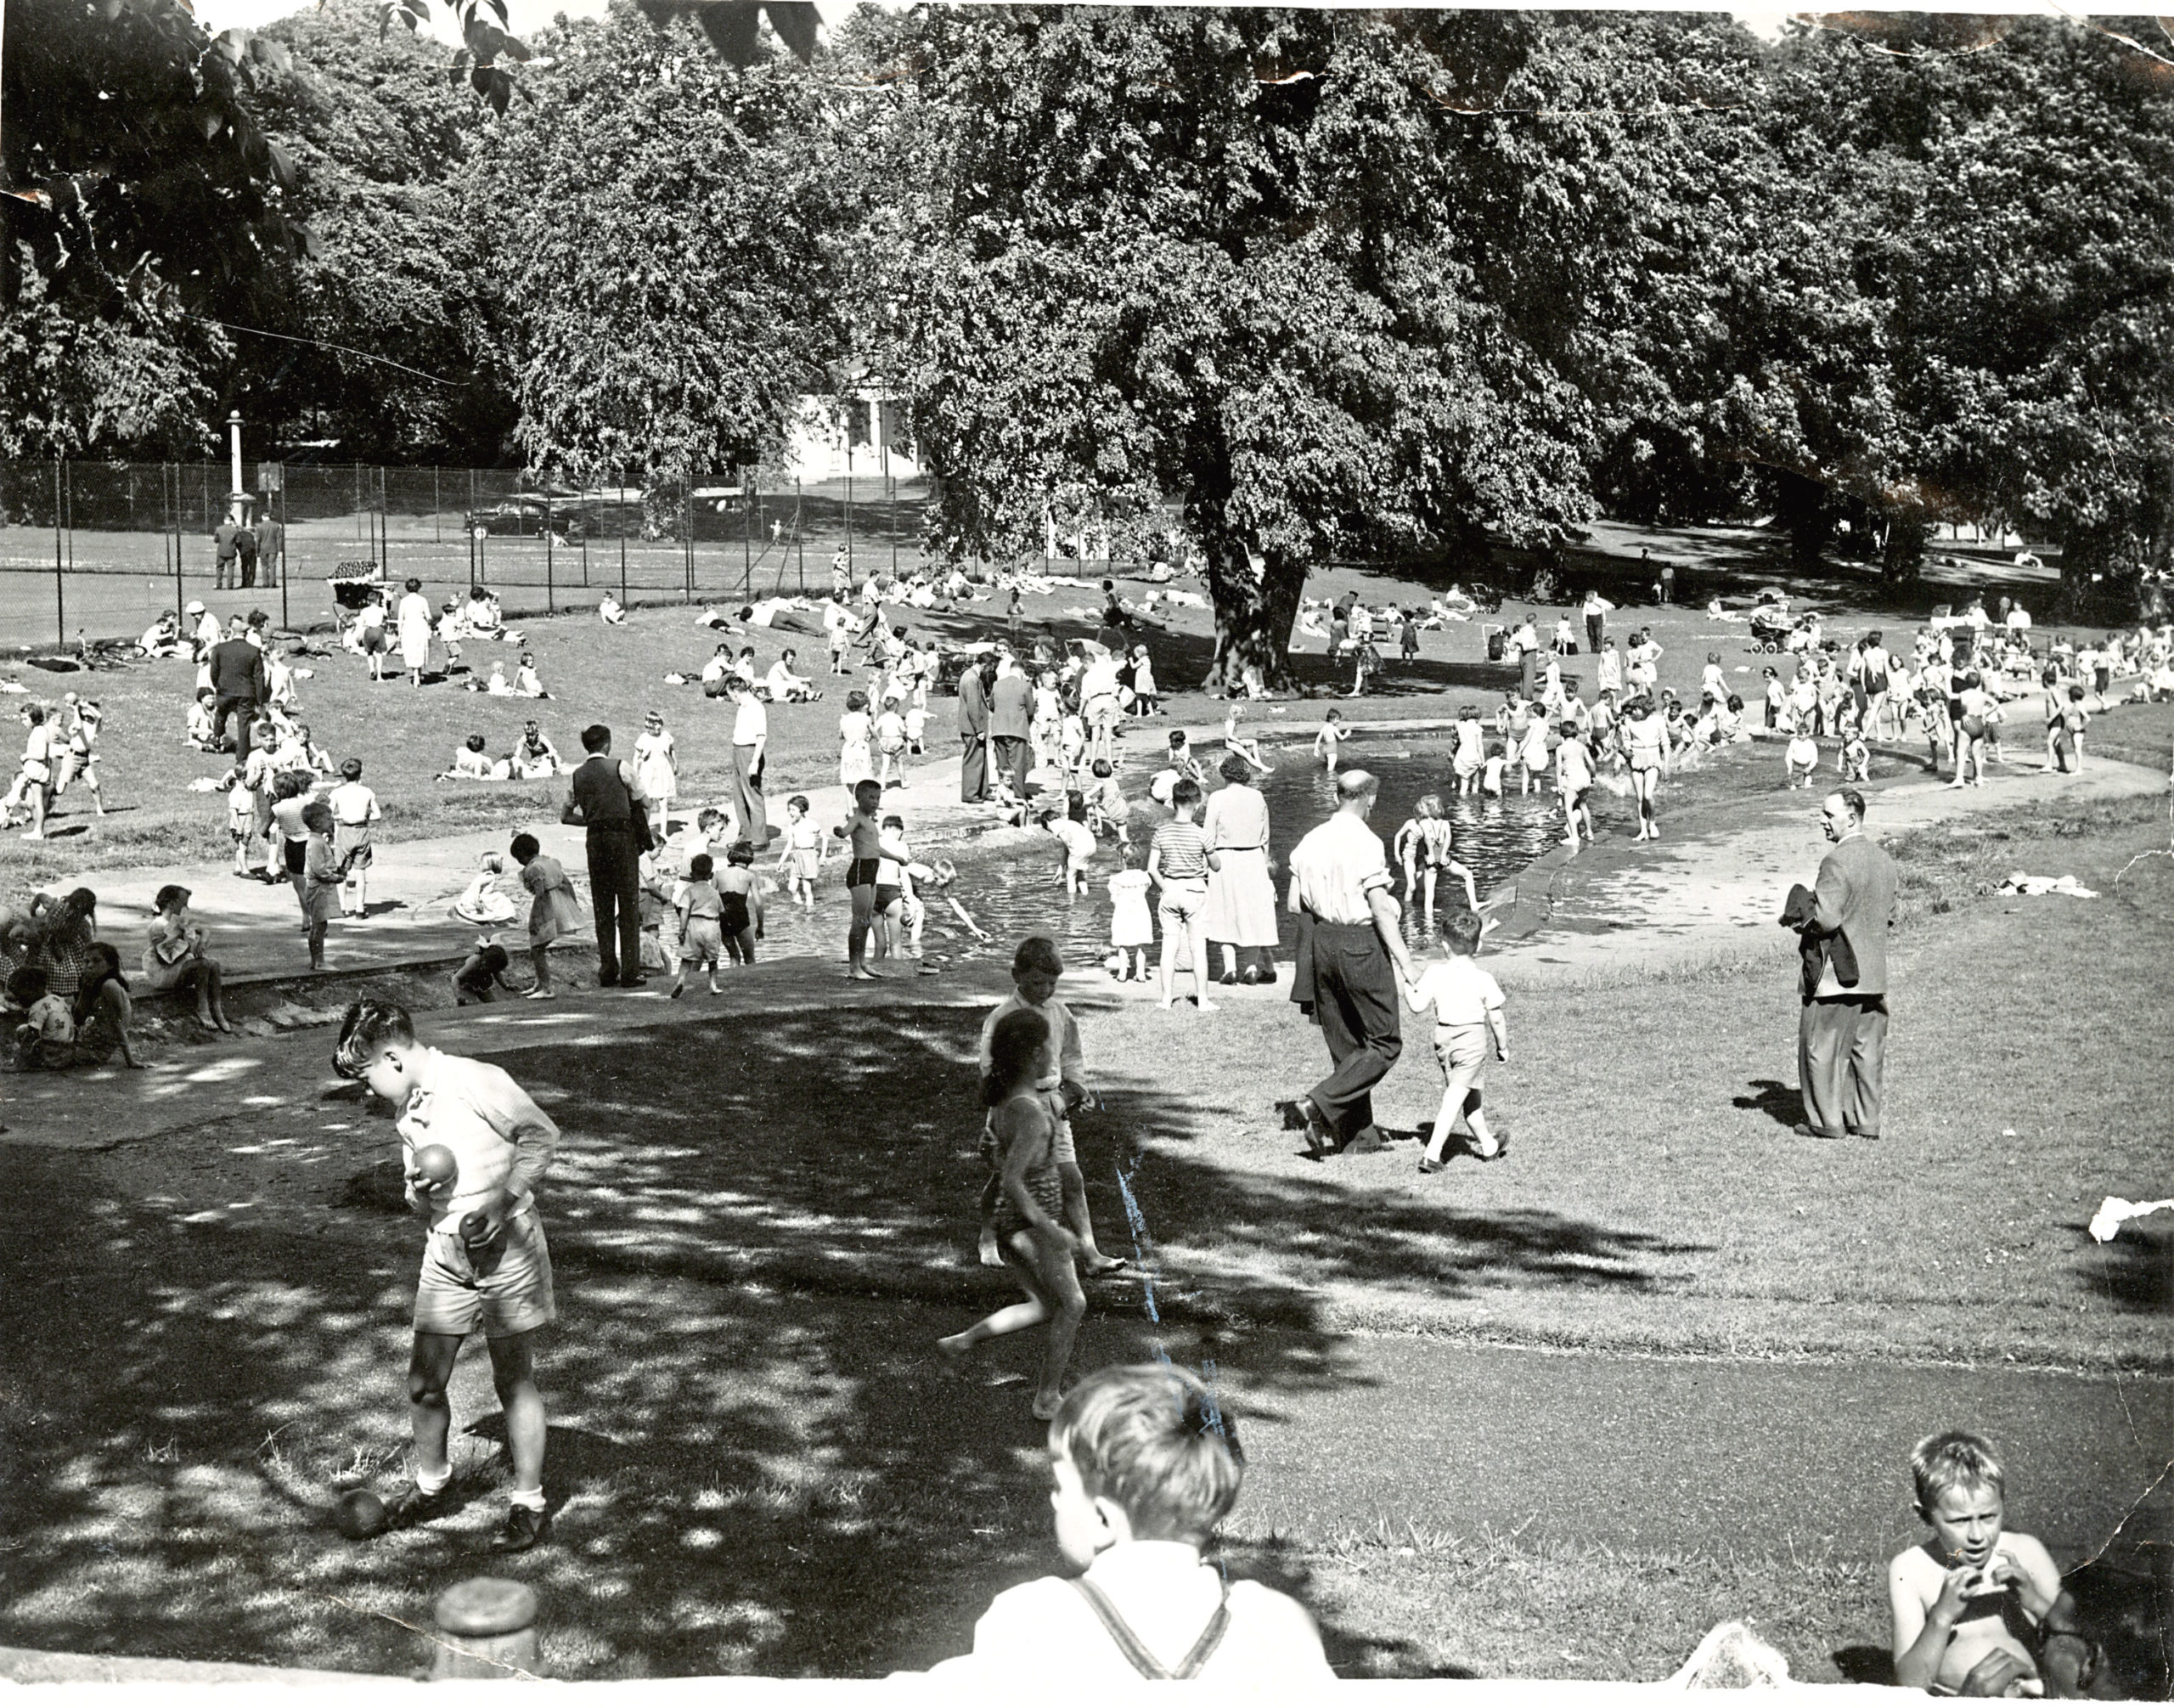 Westburn Park during the heatwave of 1959